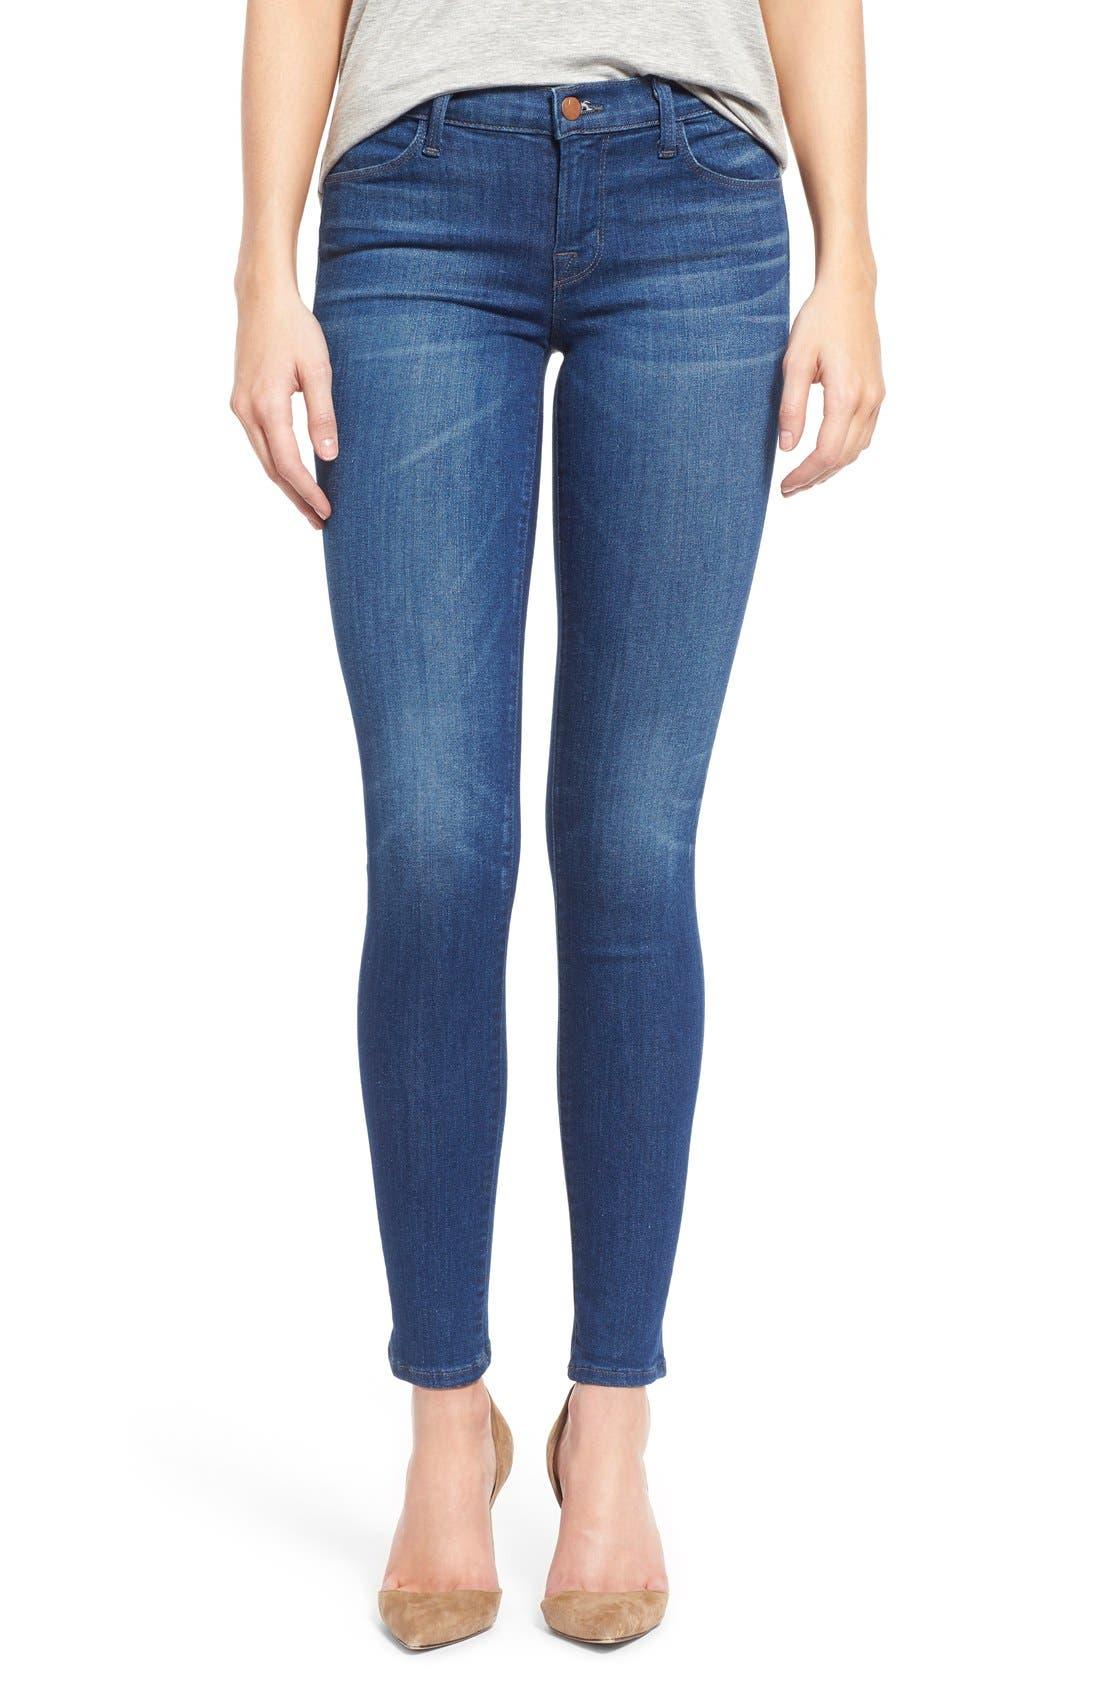 Alternate Image 1 Selected - J Brand Super Skinny Jeans (Enigma)